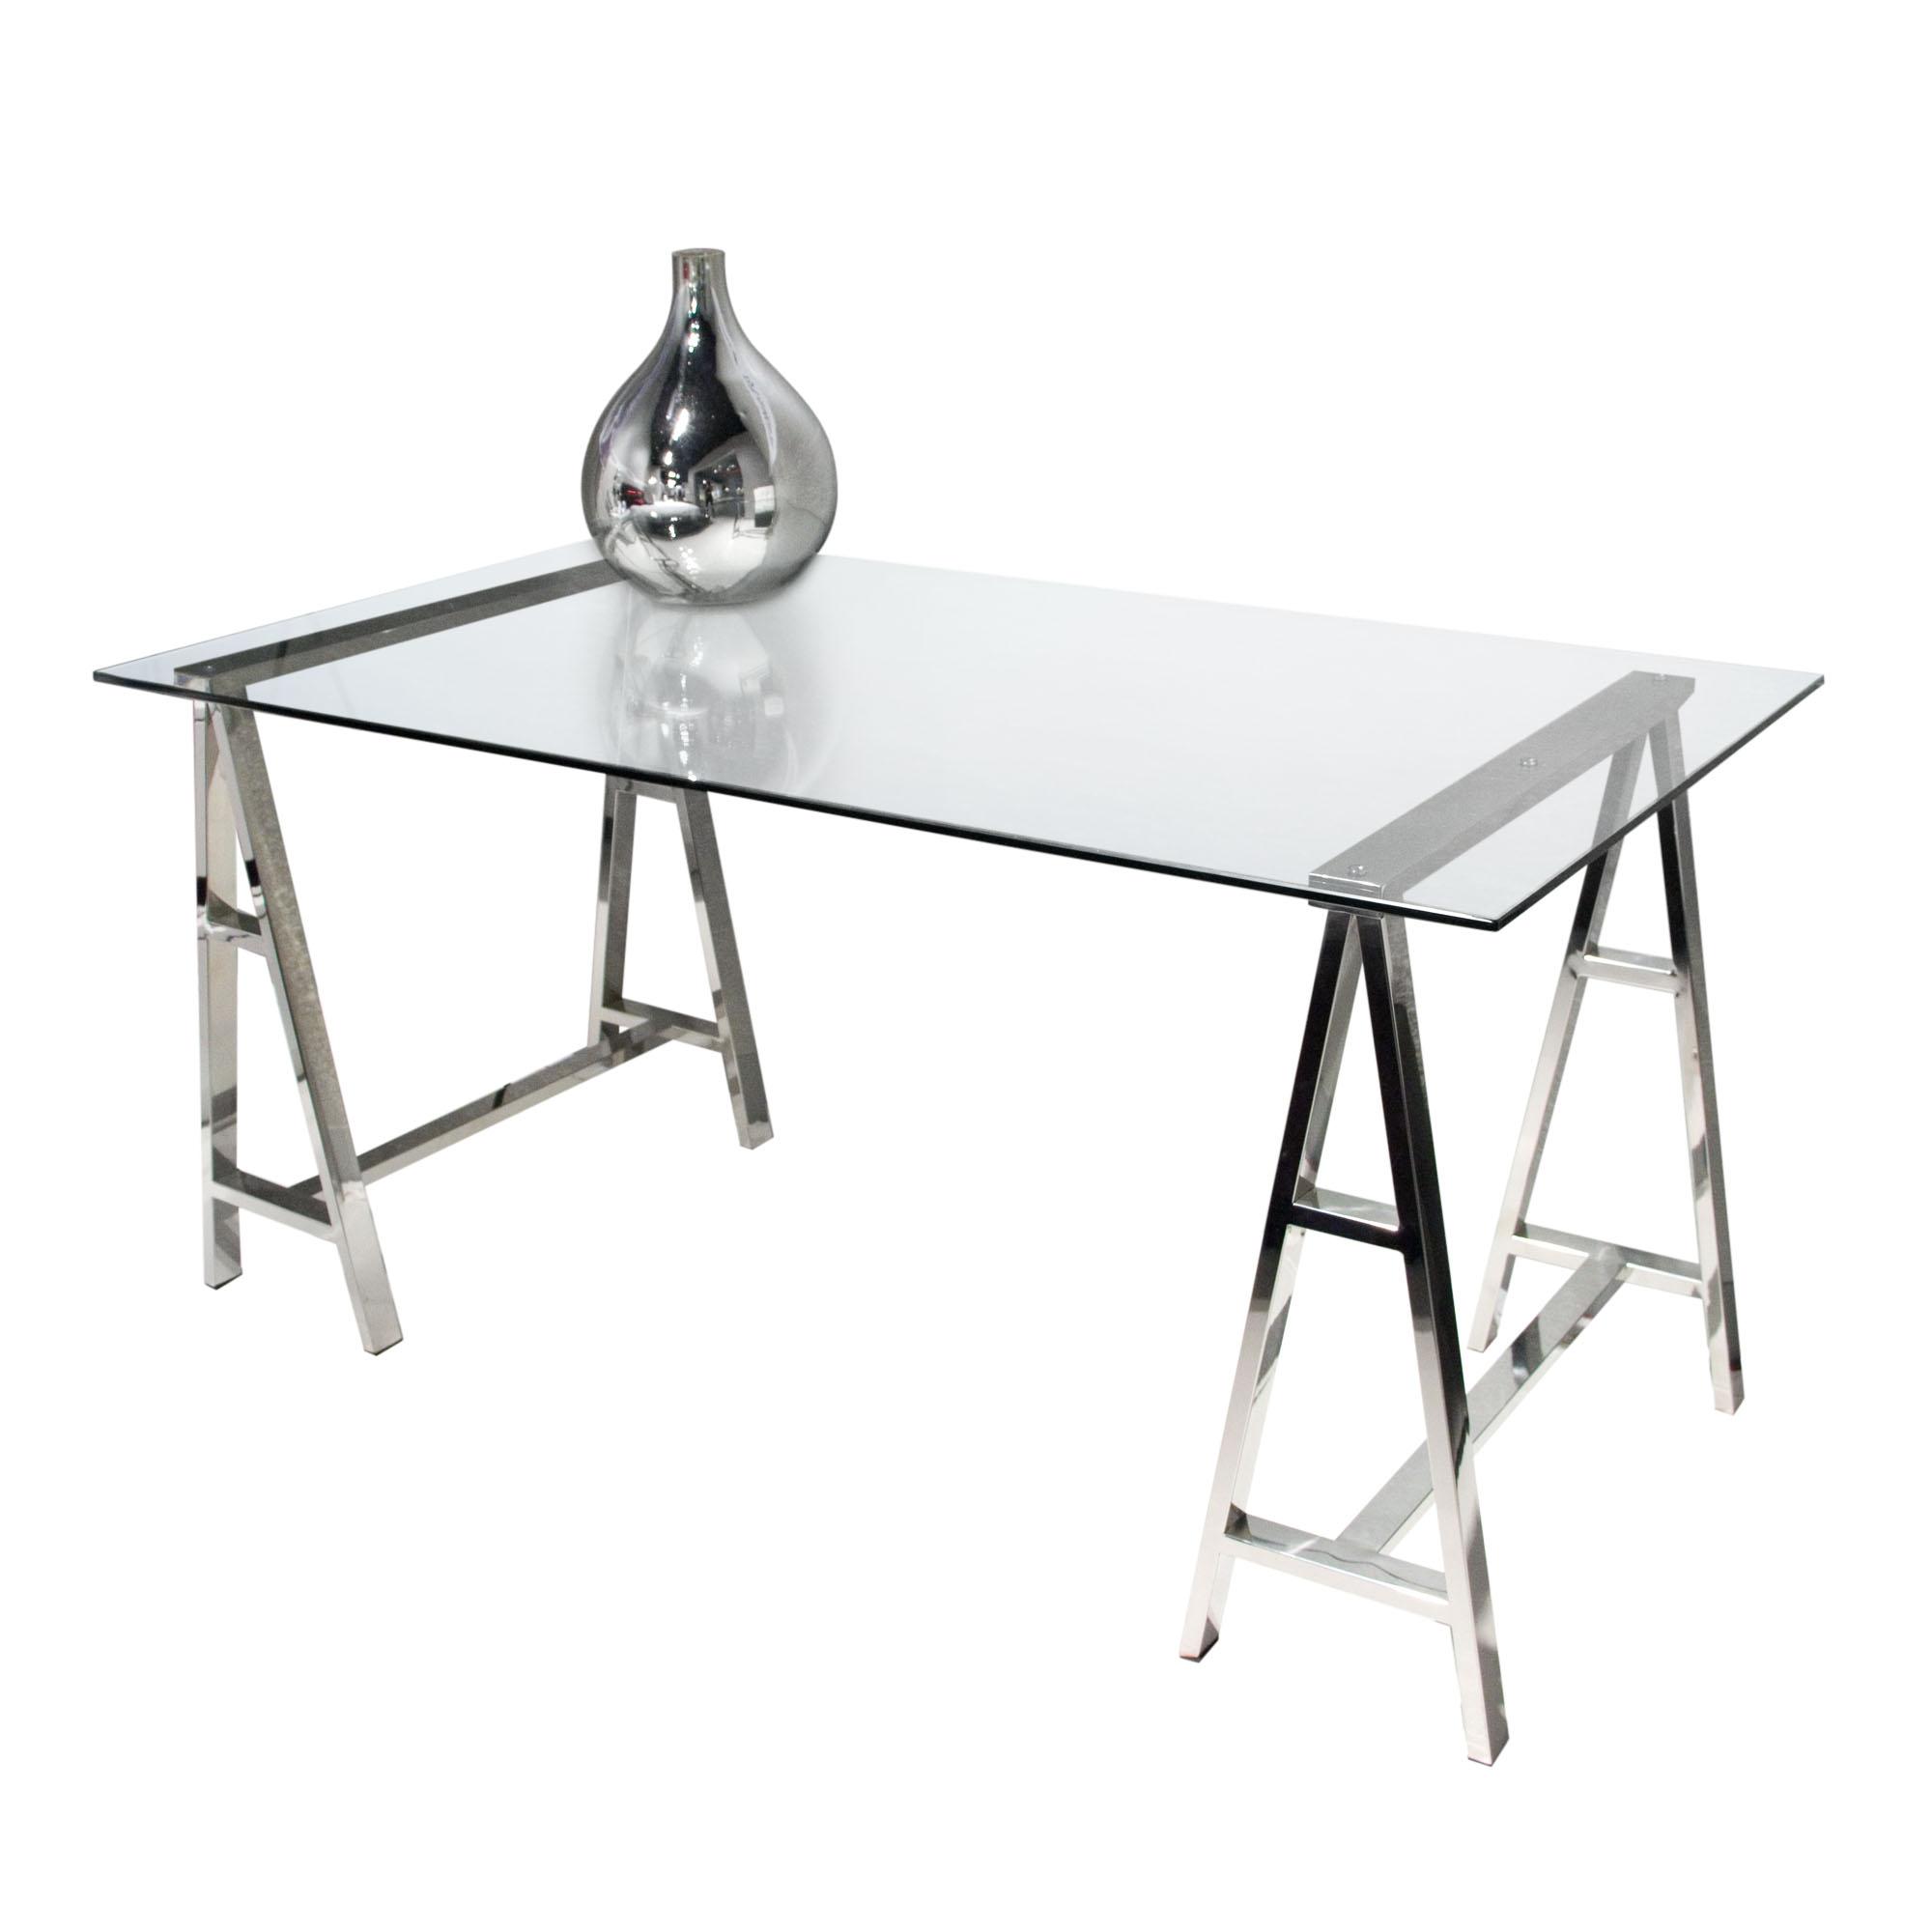 Diamond Sofa Deko Stainless Steel Desk with Clear Glass Top - Item Number: DEKODEST